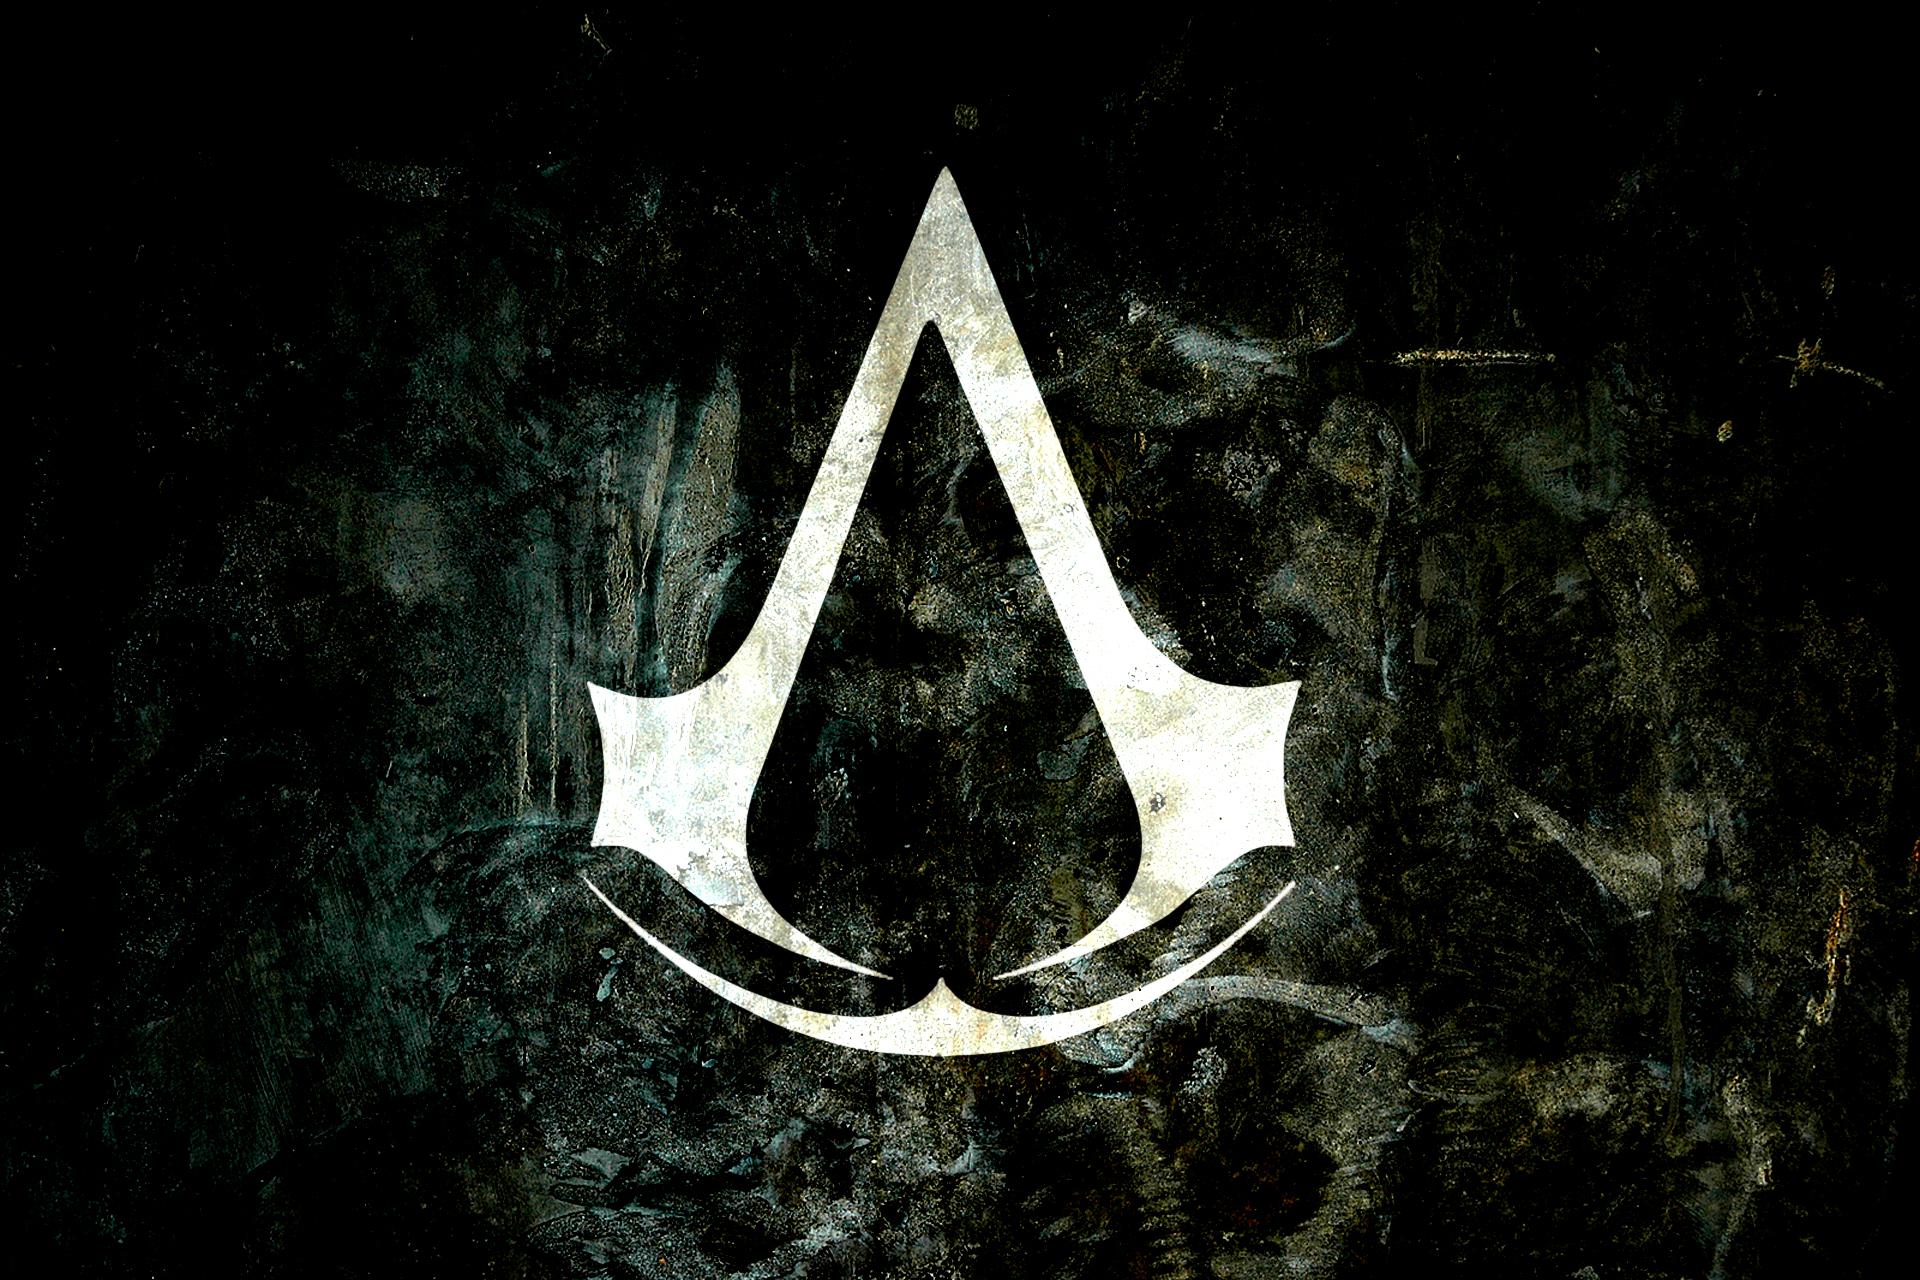 [48+] Assassins Creed Logo Wallpaper on WallpaperSafari